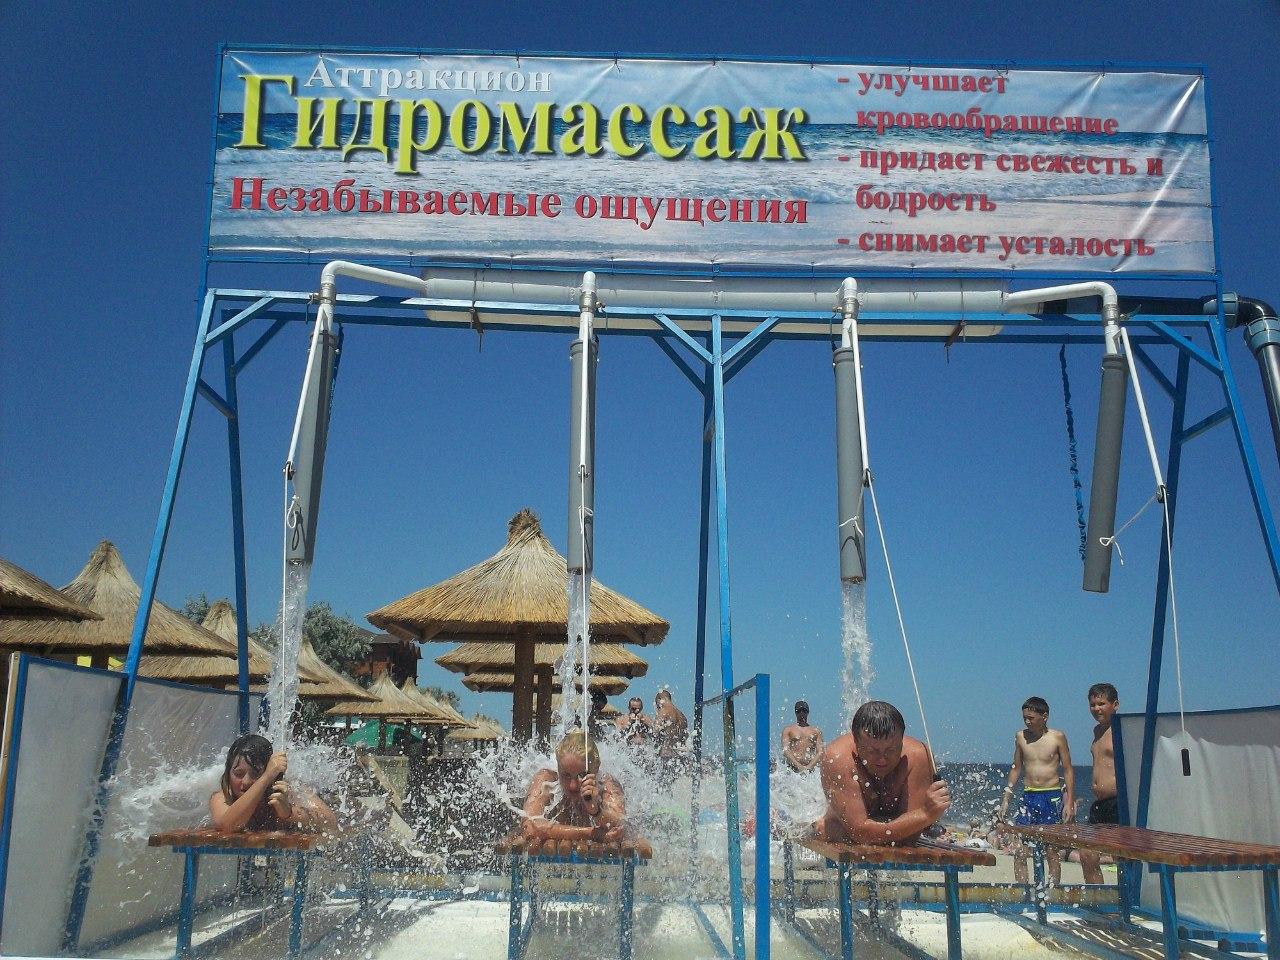 Азовское море. Бердянск. 2012 г. KW7JnmexbaY